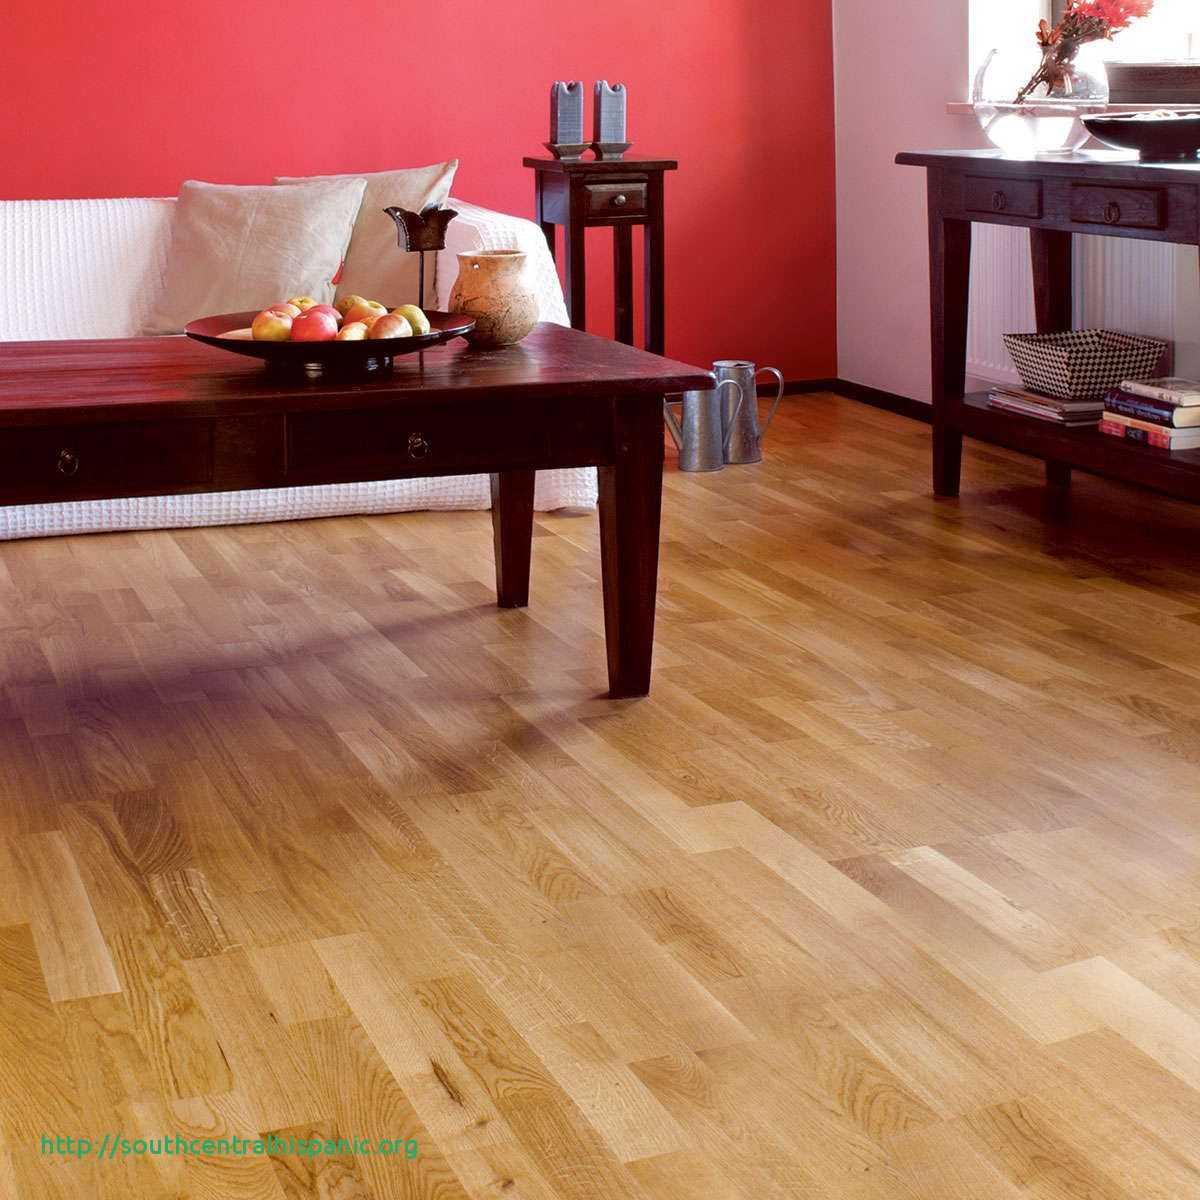 how to lay engineered hardwood flooring over concrete of engineered wood flooring on concrete slab meilleur de natura oak for engineered wood flooring on concrete slab meilleur de natura oak brooklyn